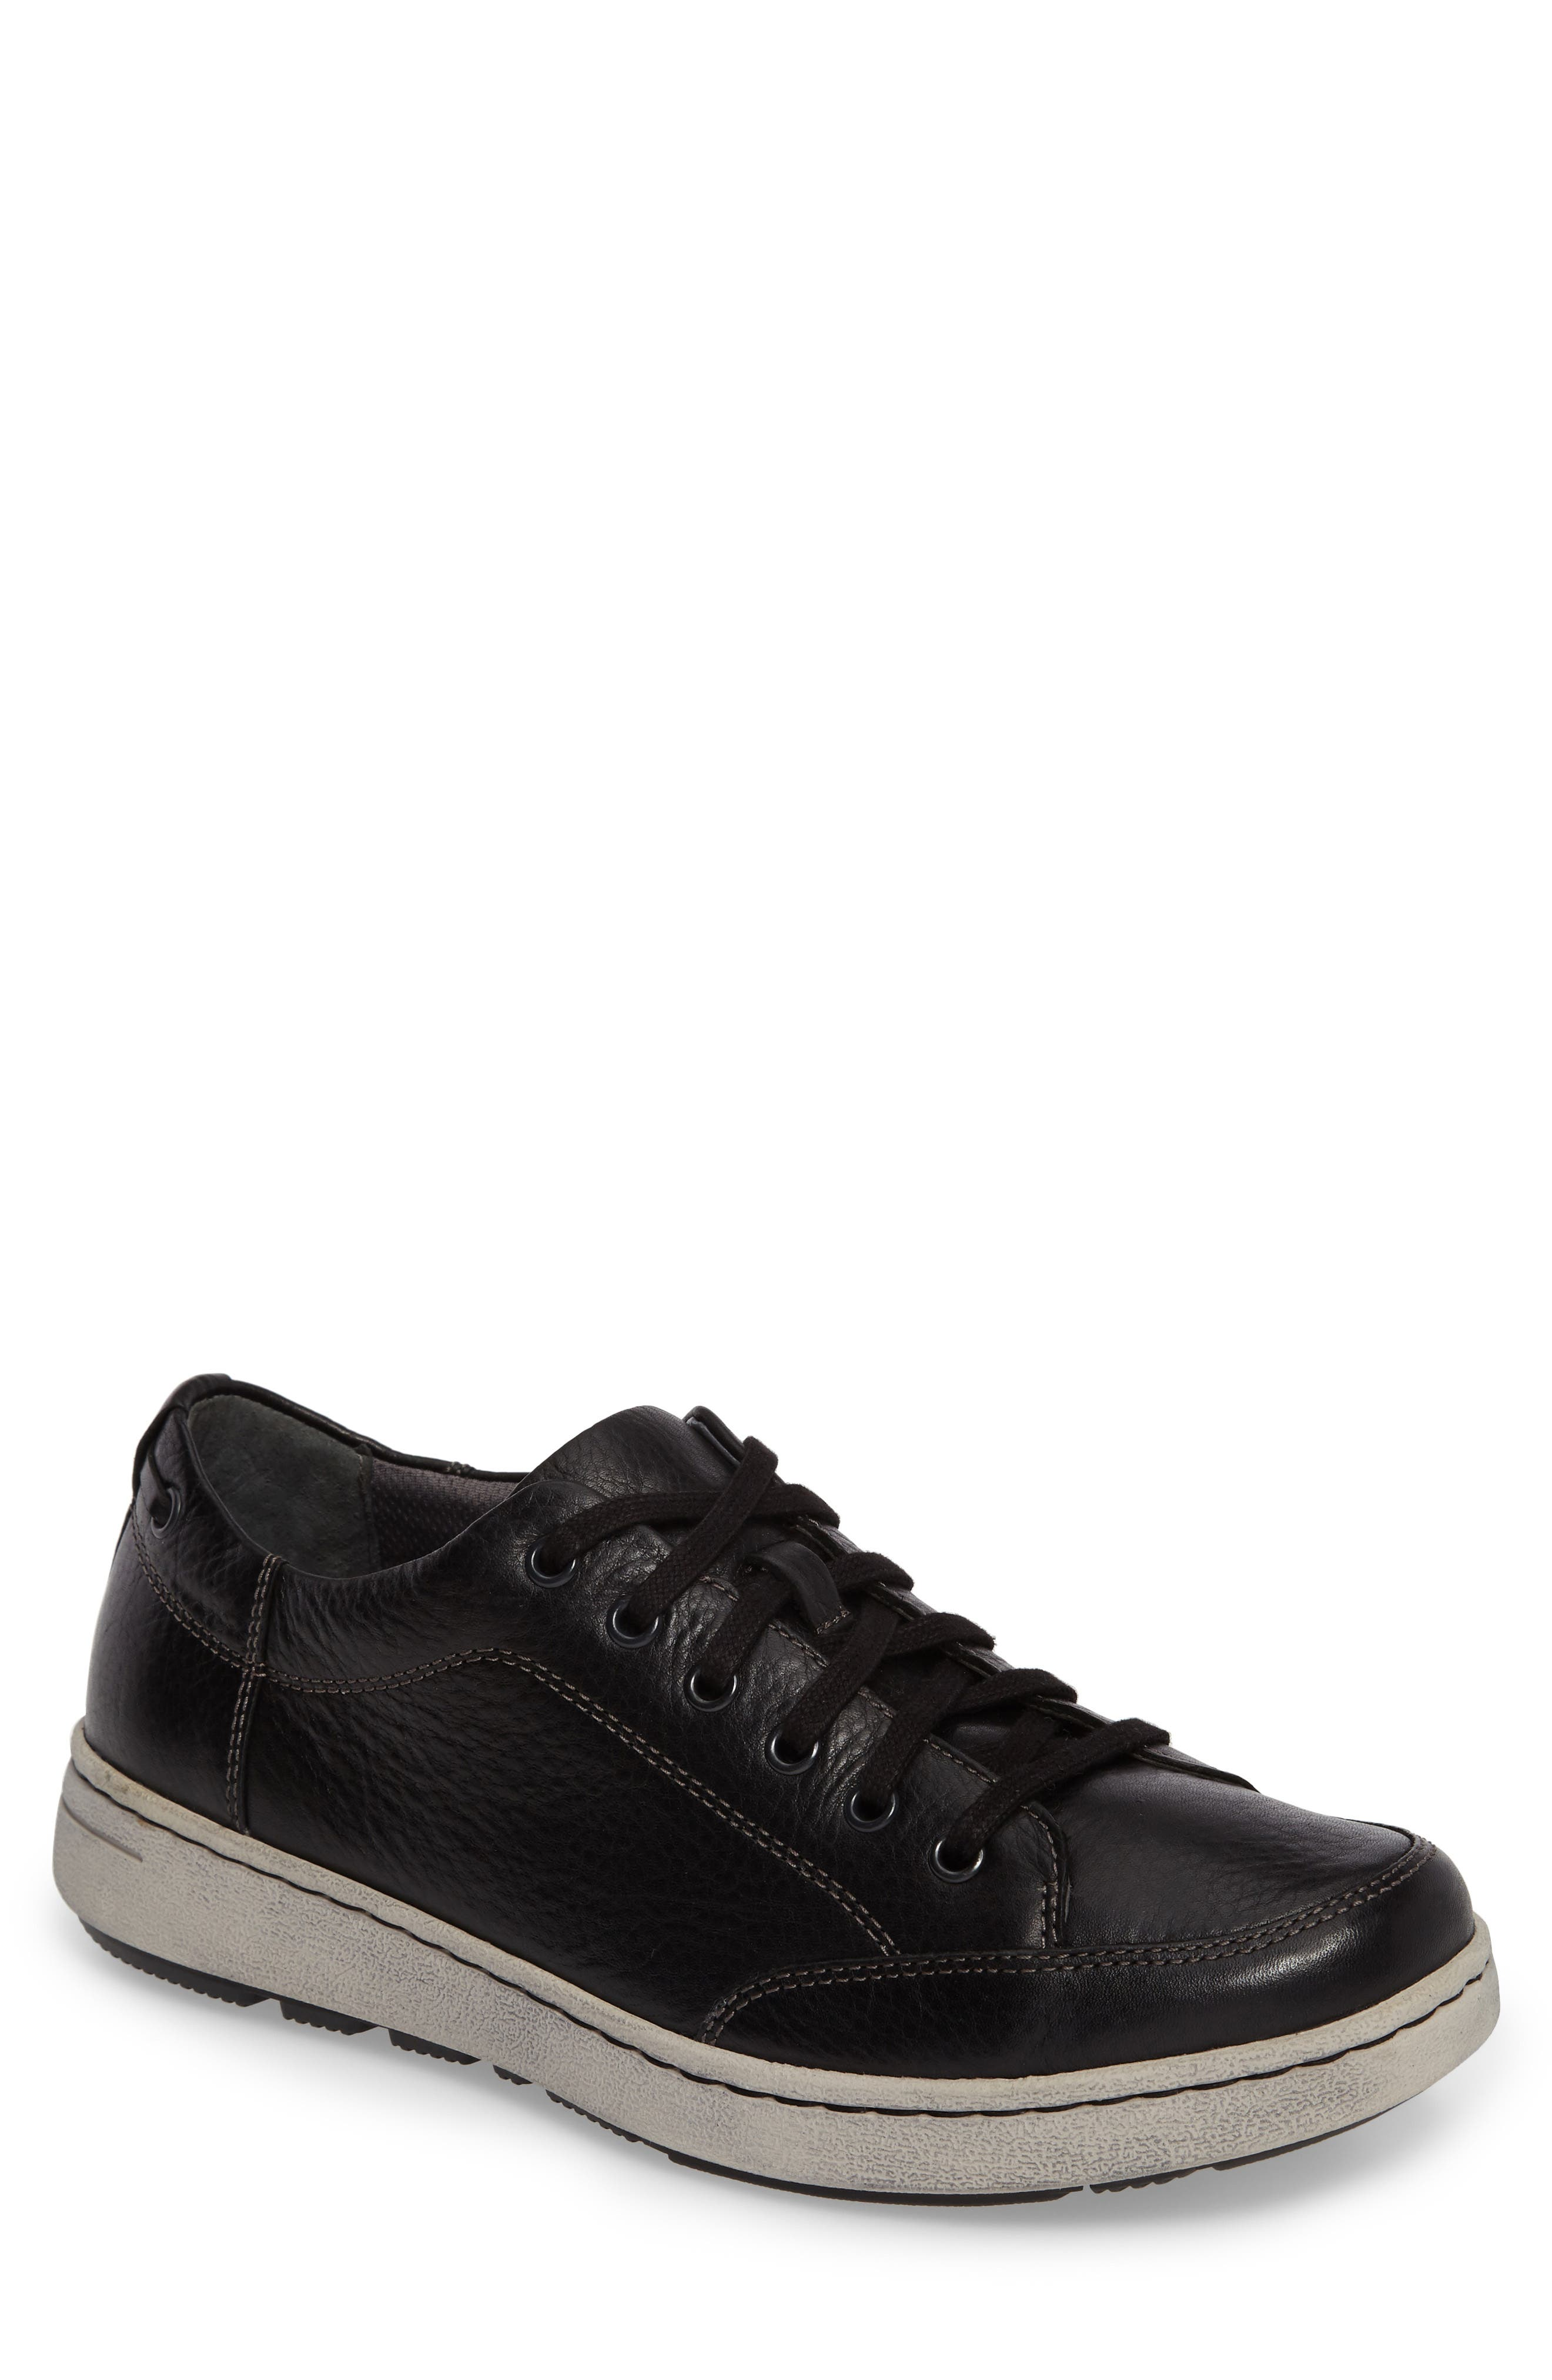 DANSKO 'Vaughn' Water-Resistant Sneaker